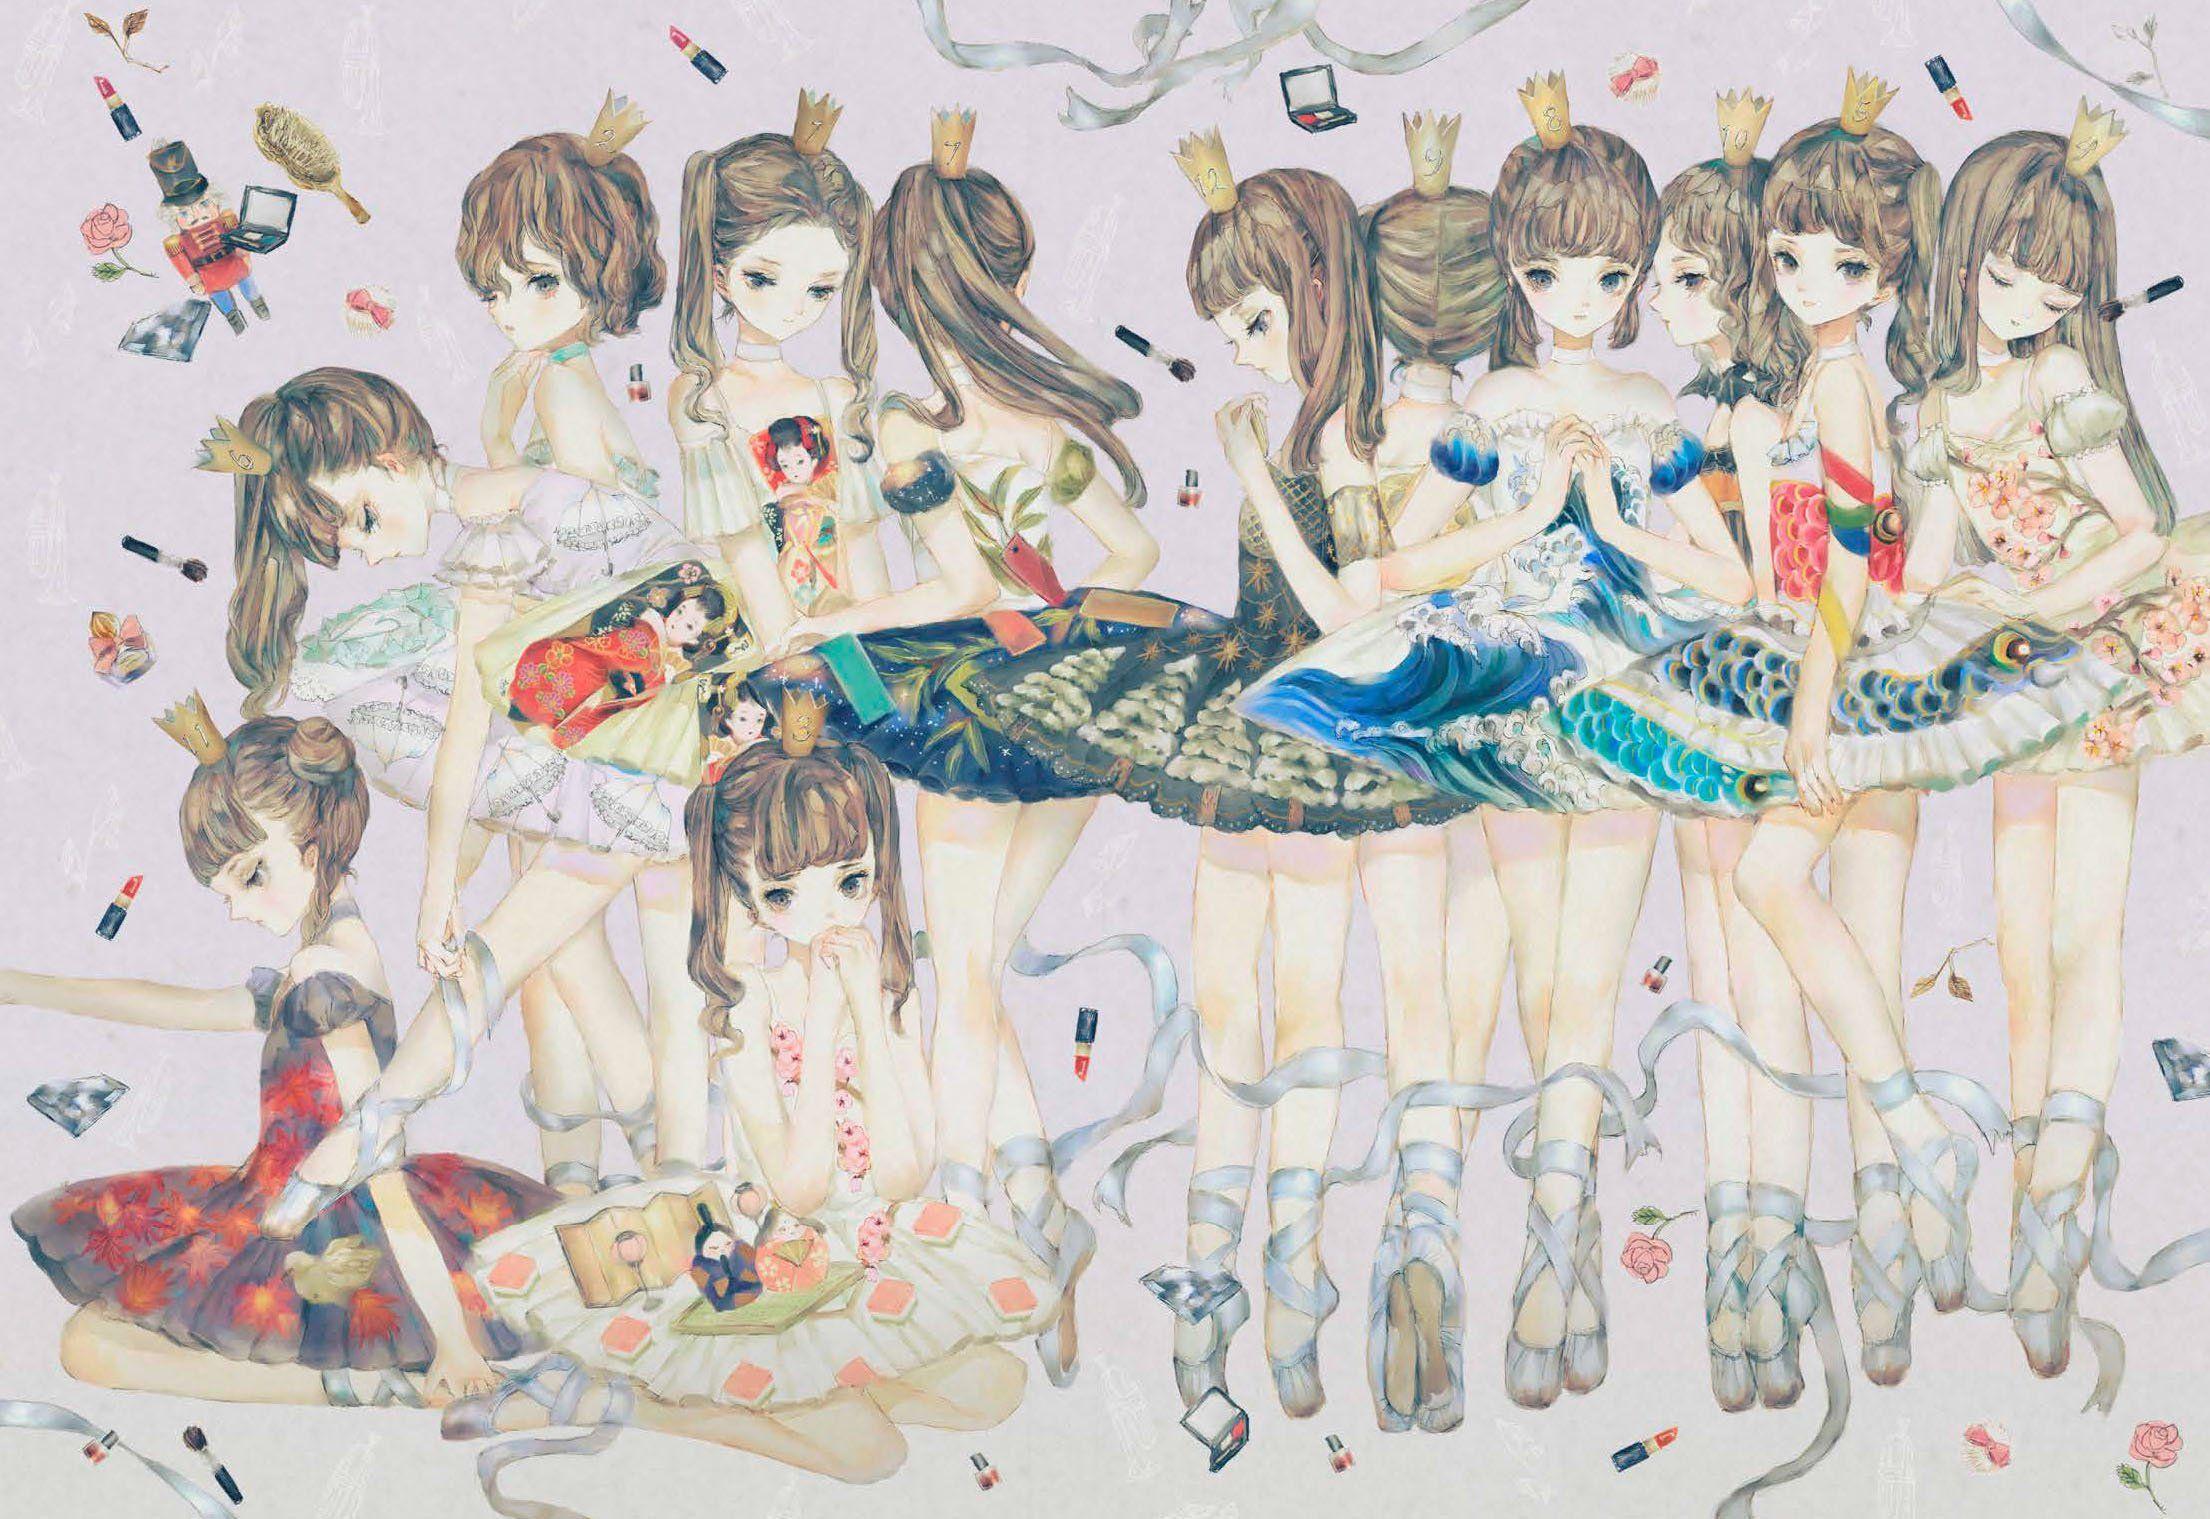 Pin von Manman Zhang auf 夜汽车 Art and illustration, Anime